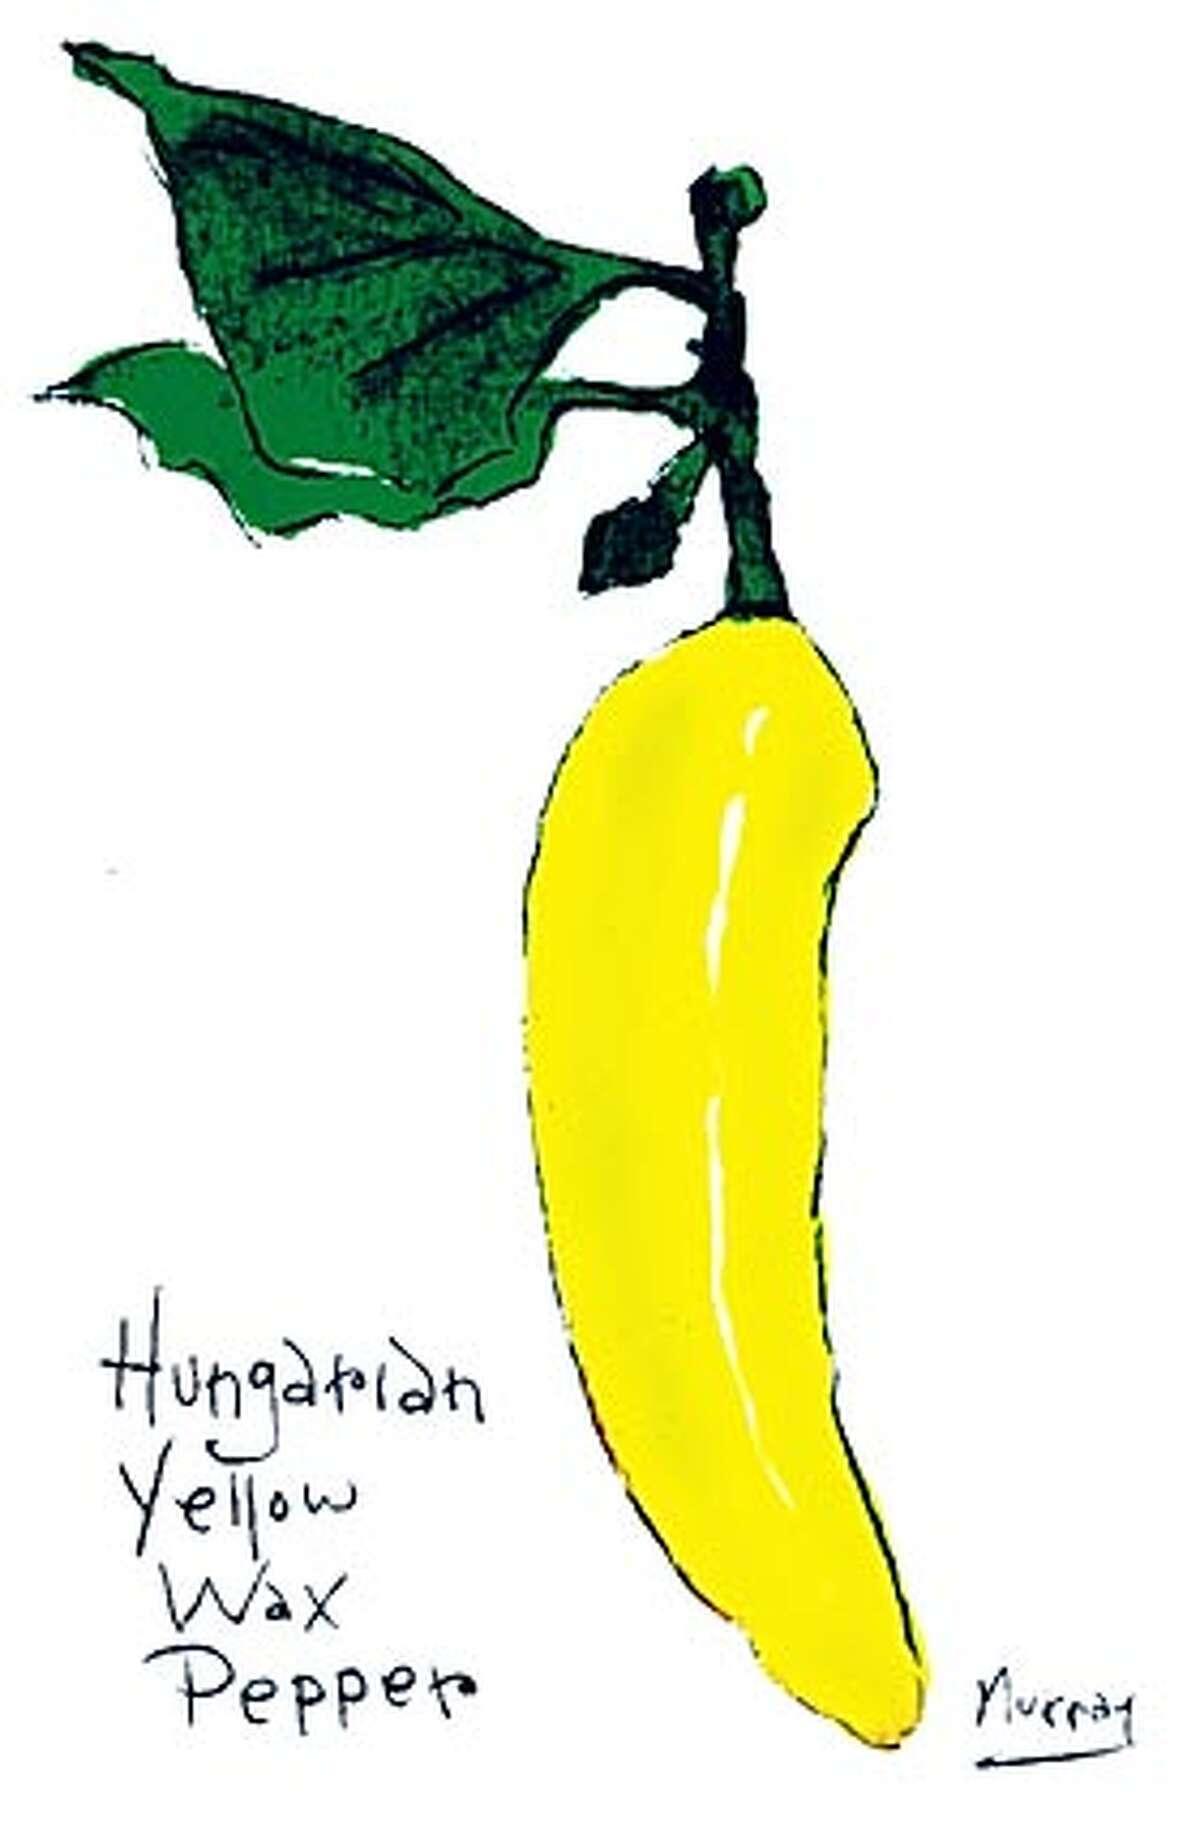 Hungarian Yellow Wax Pepper